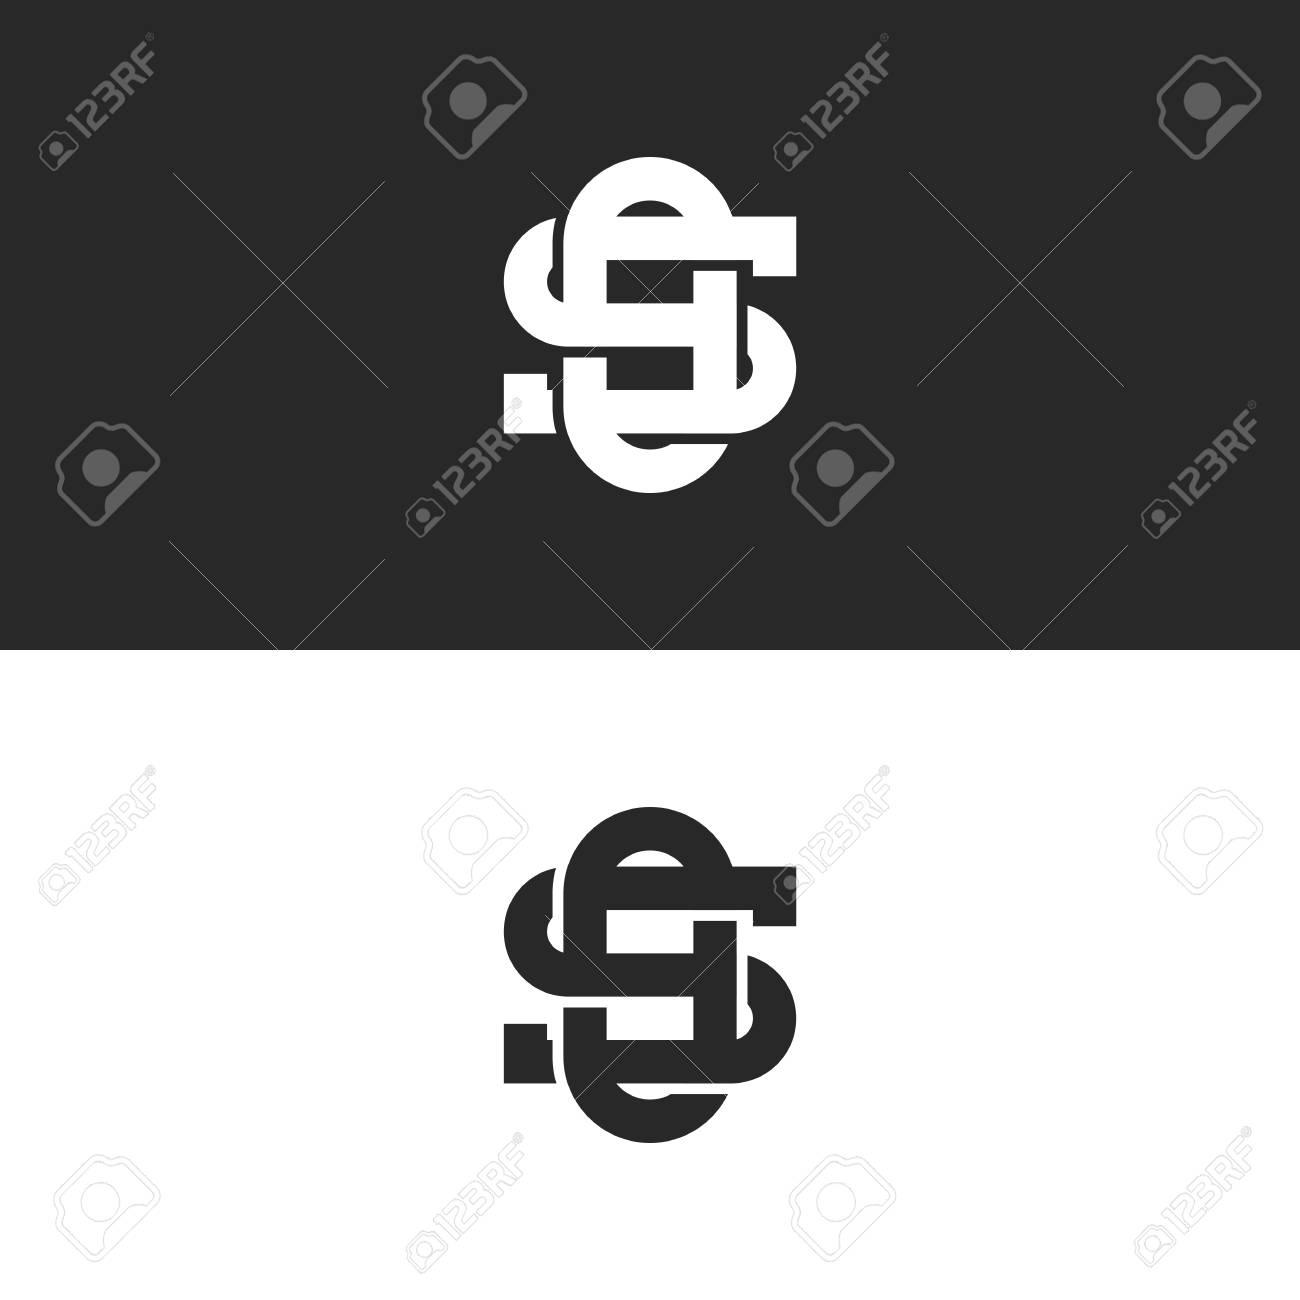 linked ornate symbols so or os letters monogram logo overlapping